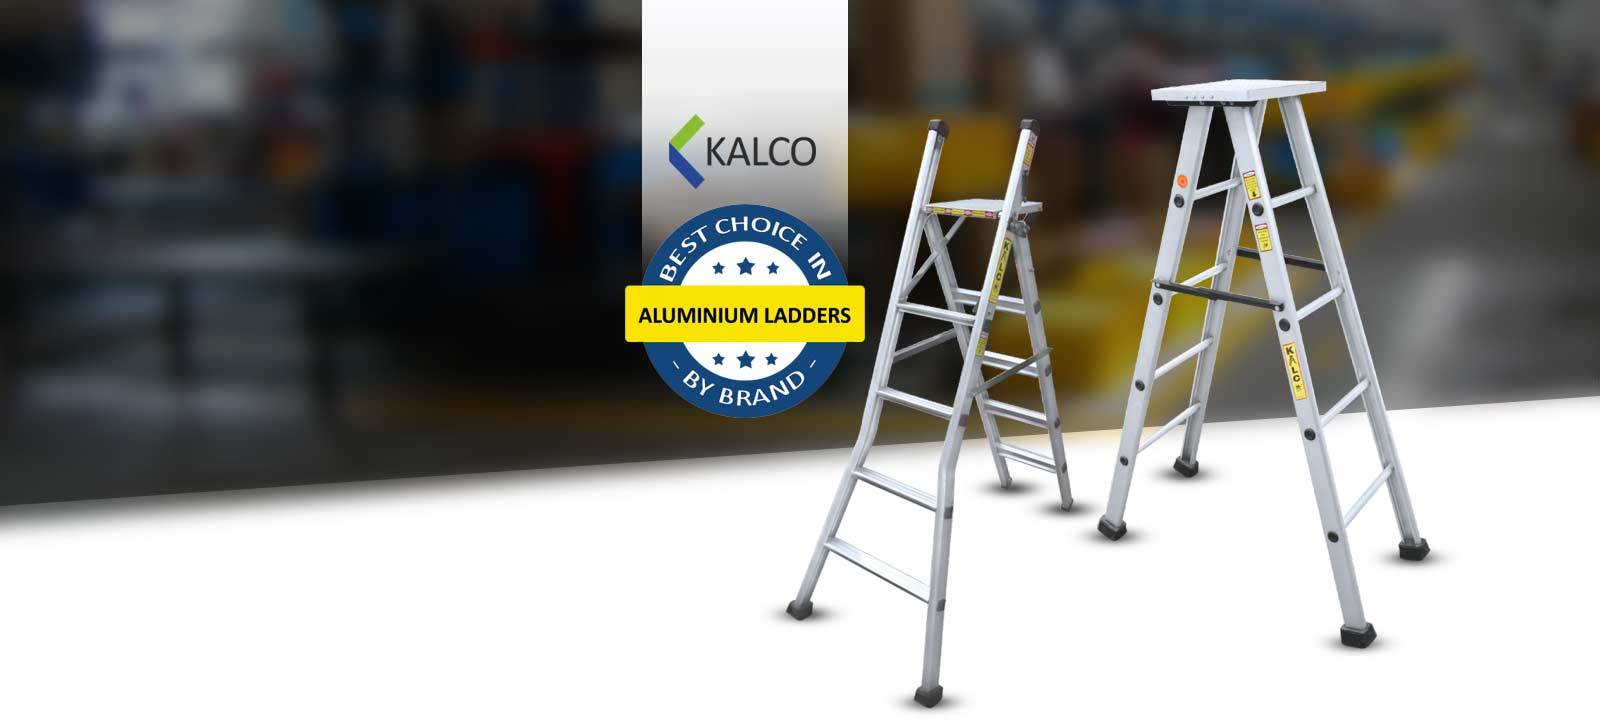 Kalco Alu-Systems - Kalco - Aluminium Doors & Windows, Ladders